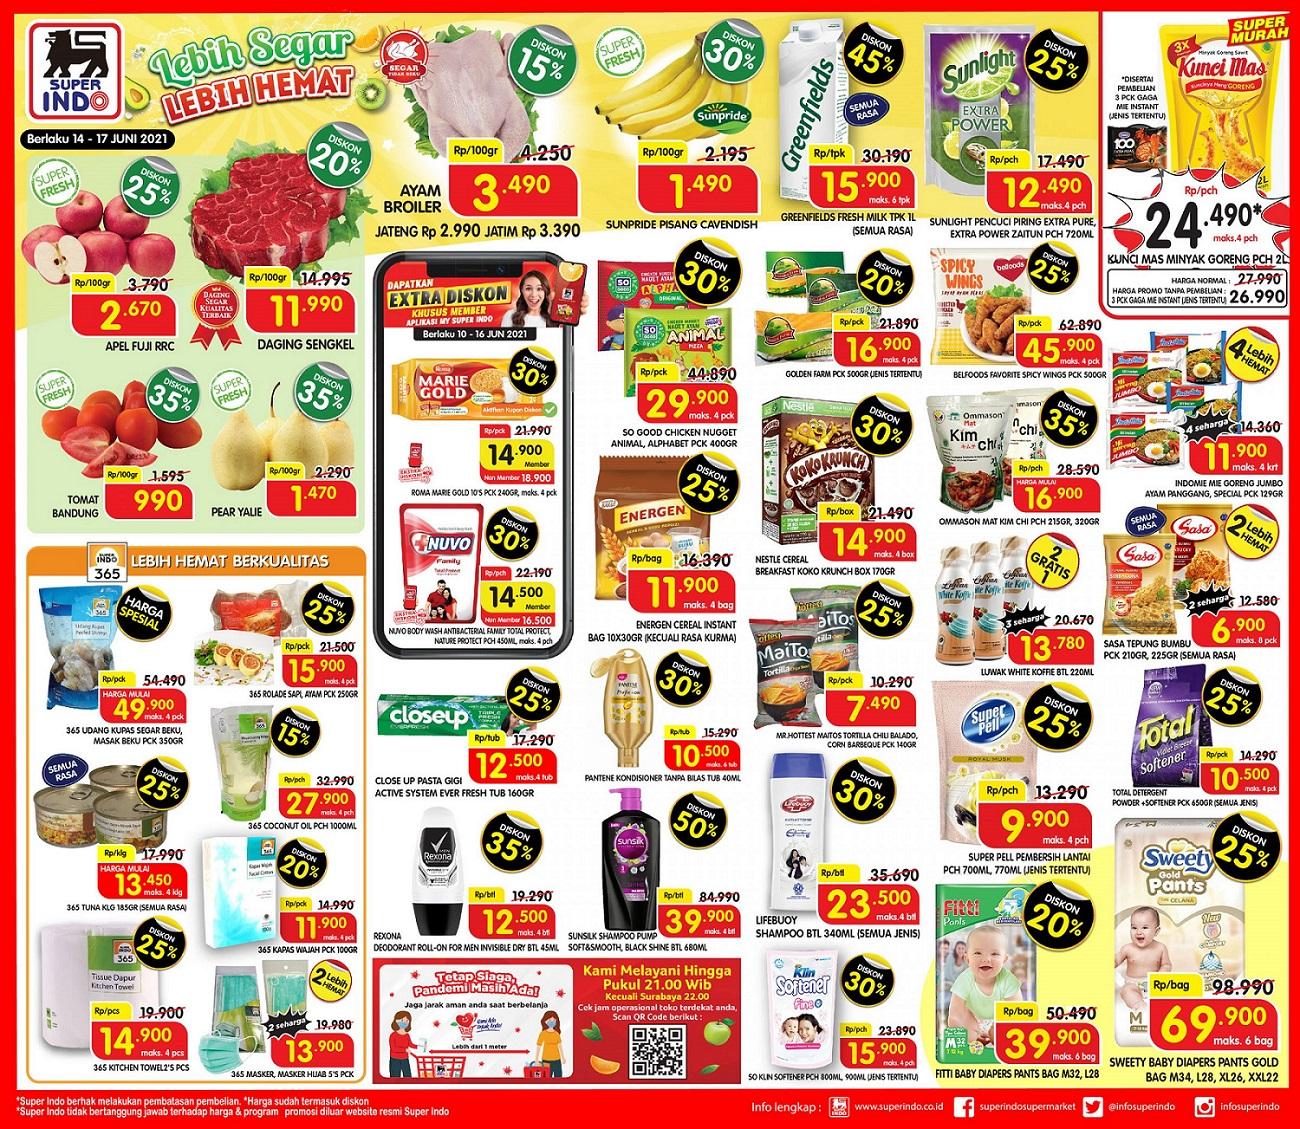 Katalog Promo Superindo 14-17 Juni 2021.